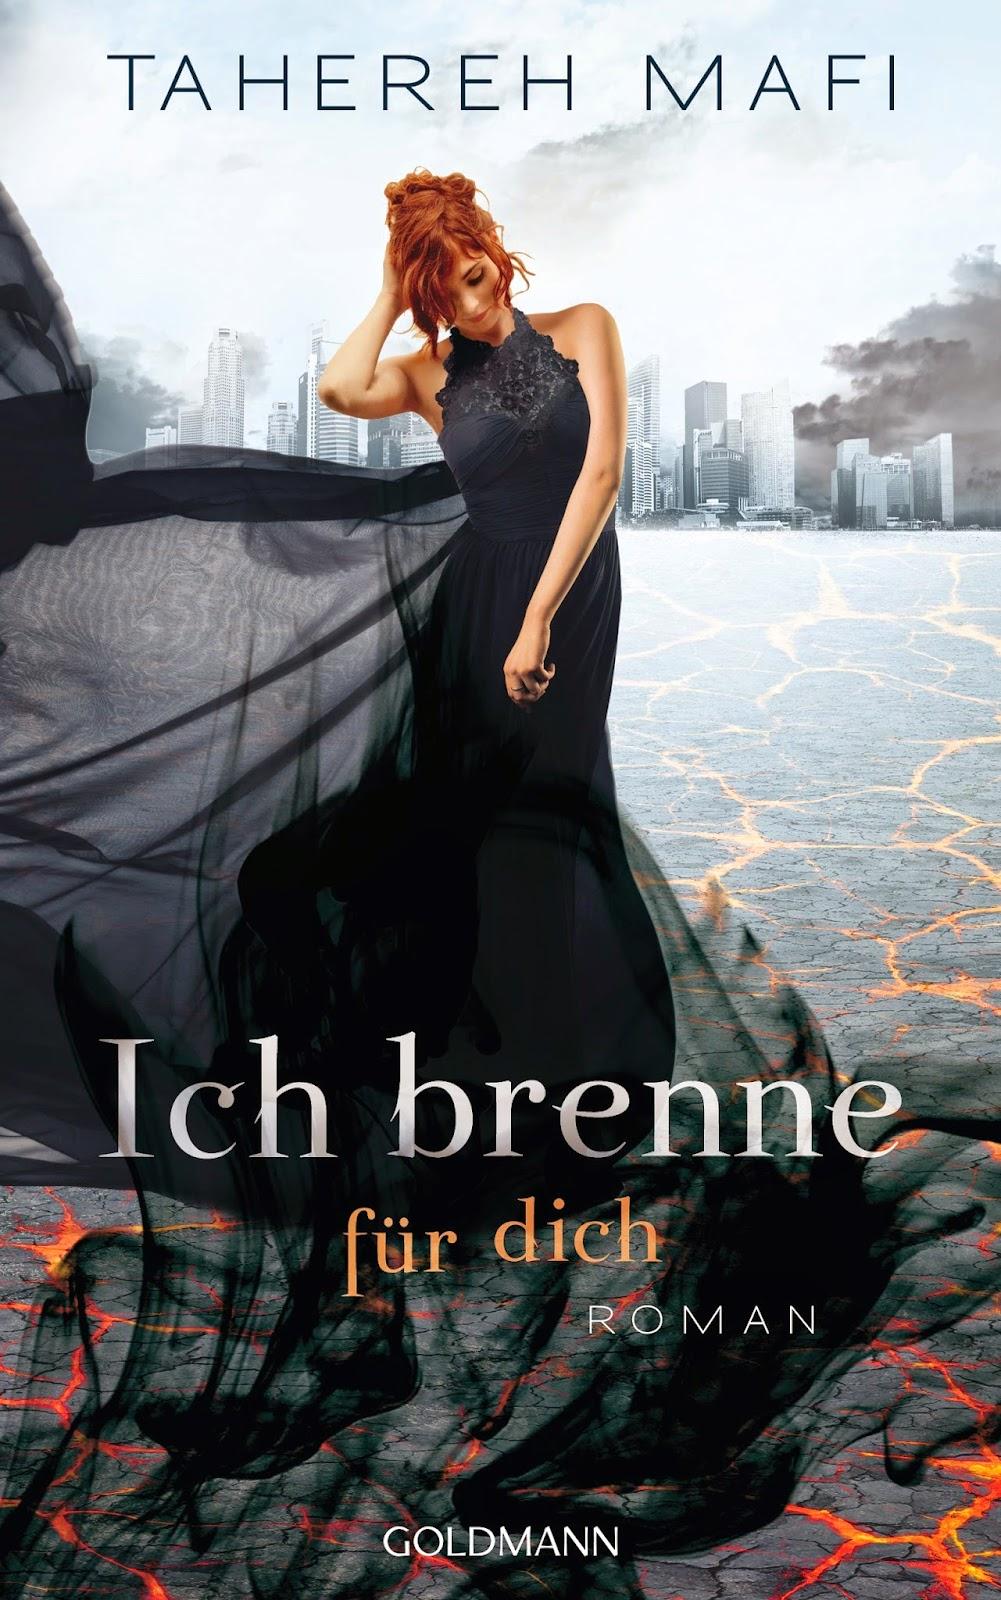 http://www.randomhouse.de/content/edition/covervoila_hires/Mafi_TIch_brenne_fuer_dich_147178.jpg